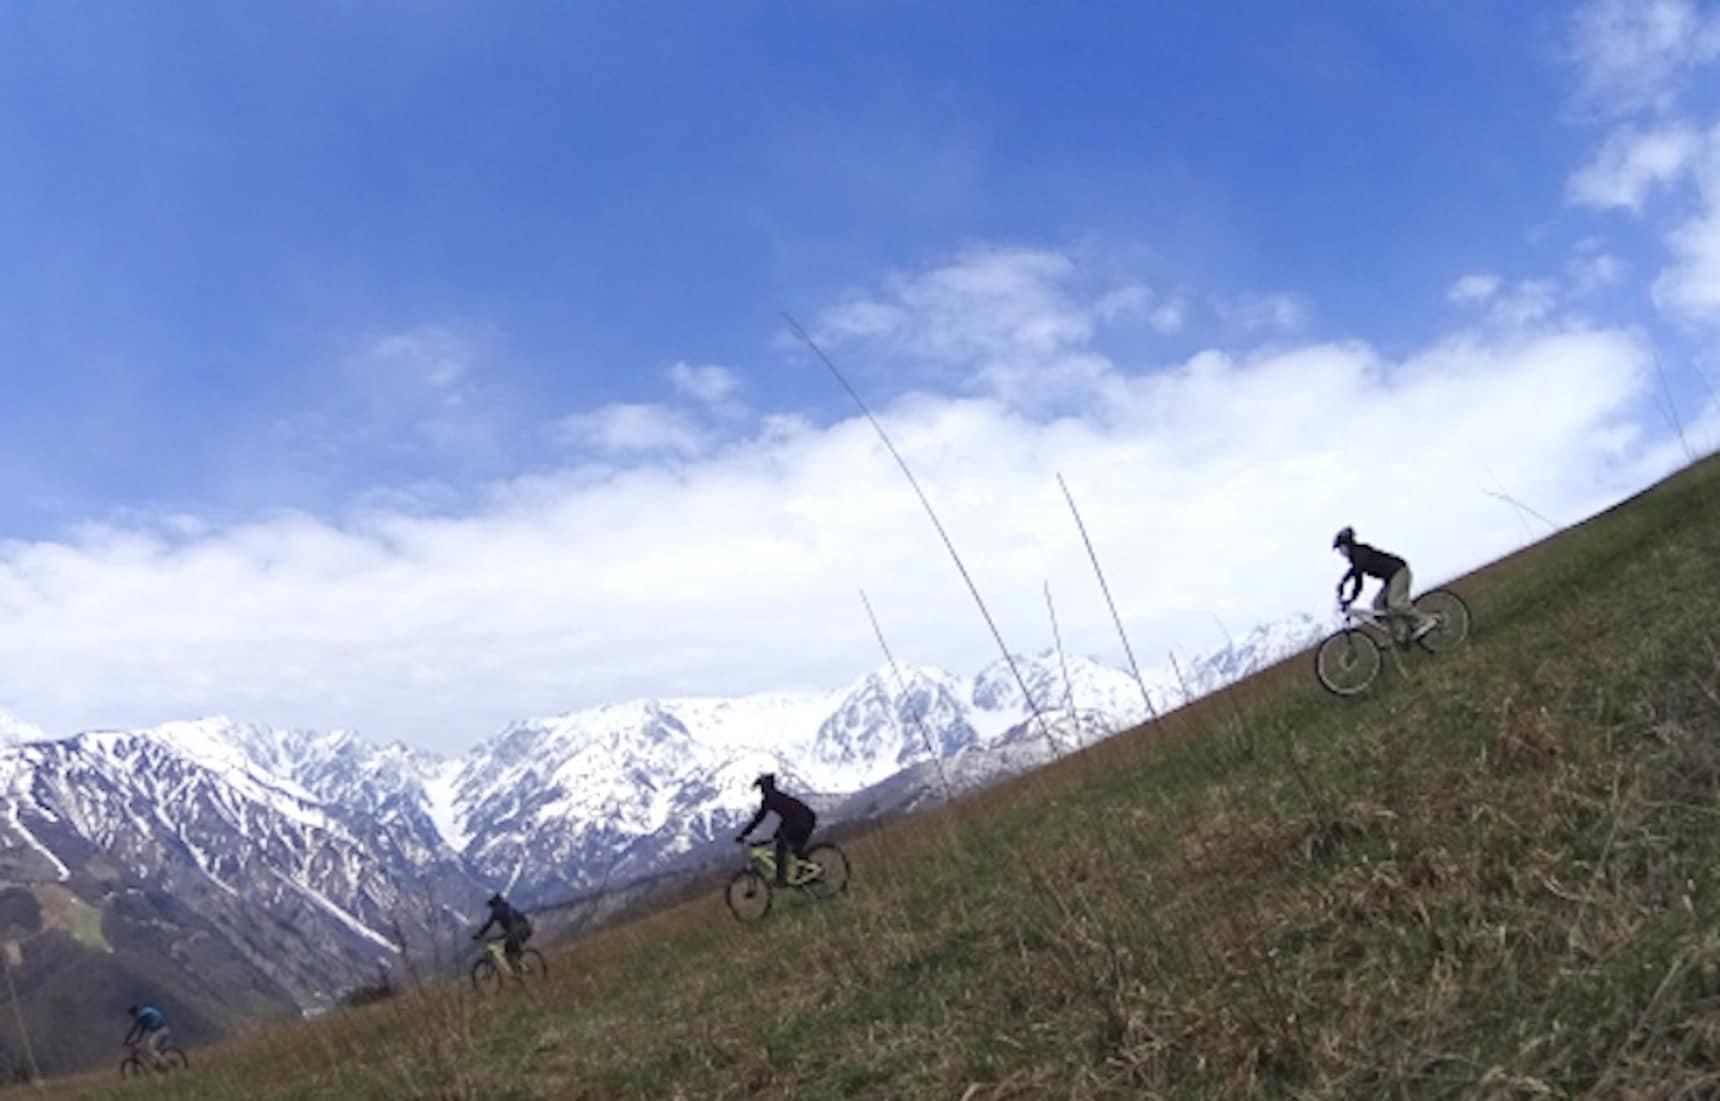 Go Downhill Mountain Biking in Gunma & Nagano